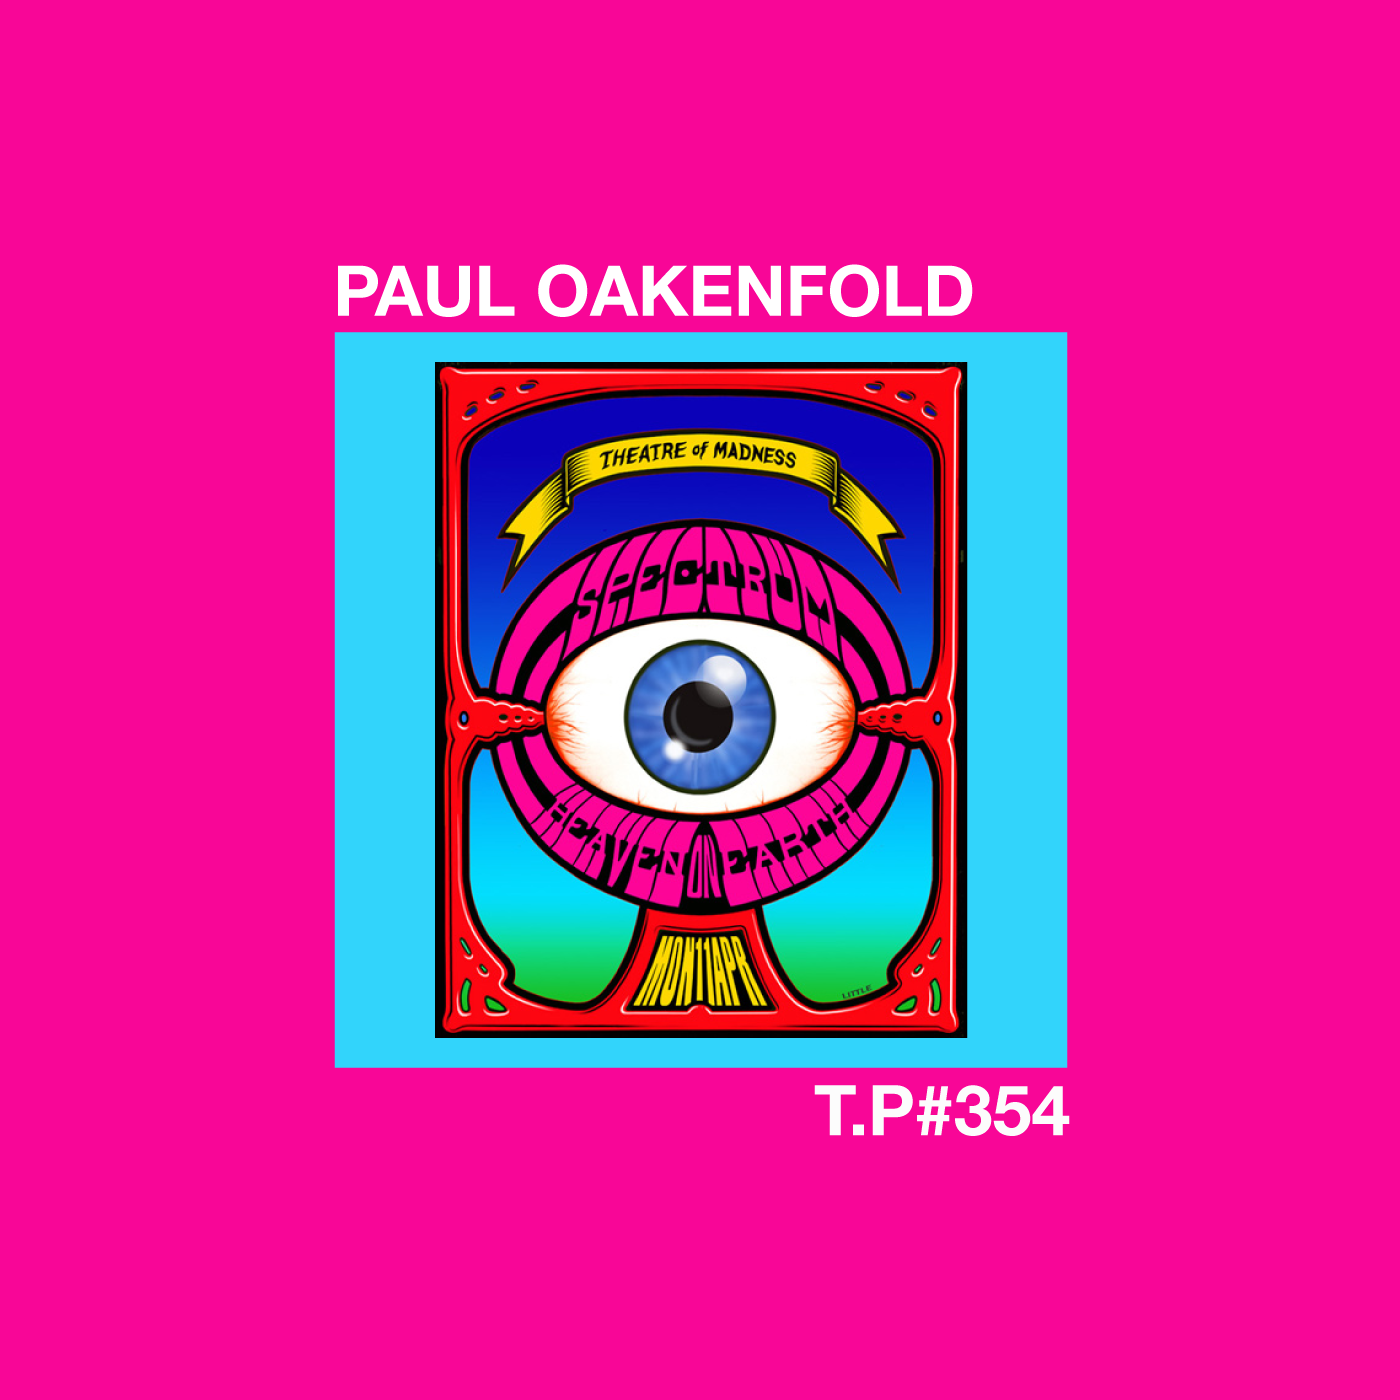 Spectrum, Dj, Mix, Paul Oakenfold, 1988, London, Acid House. Club, Classic, Dave Little